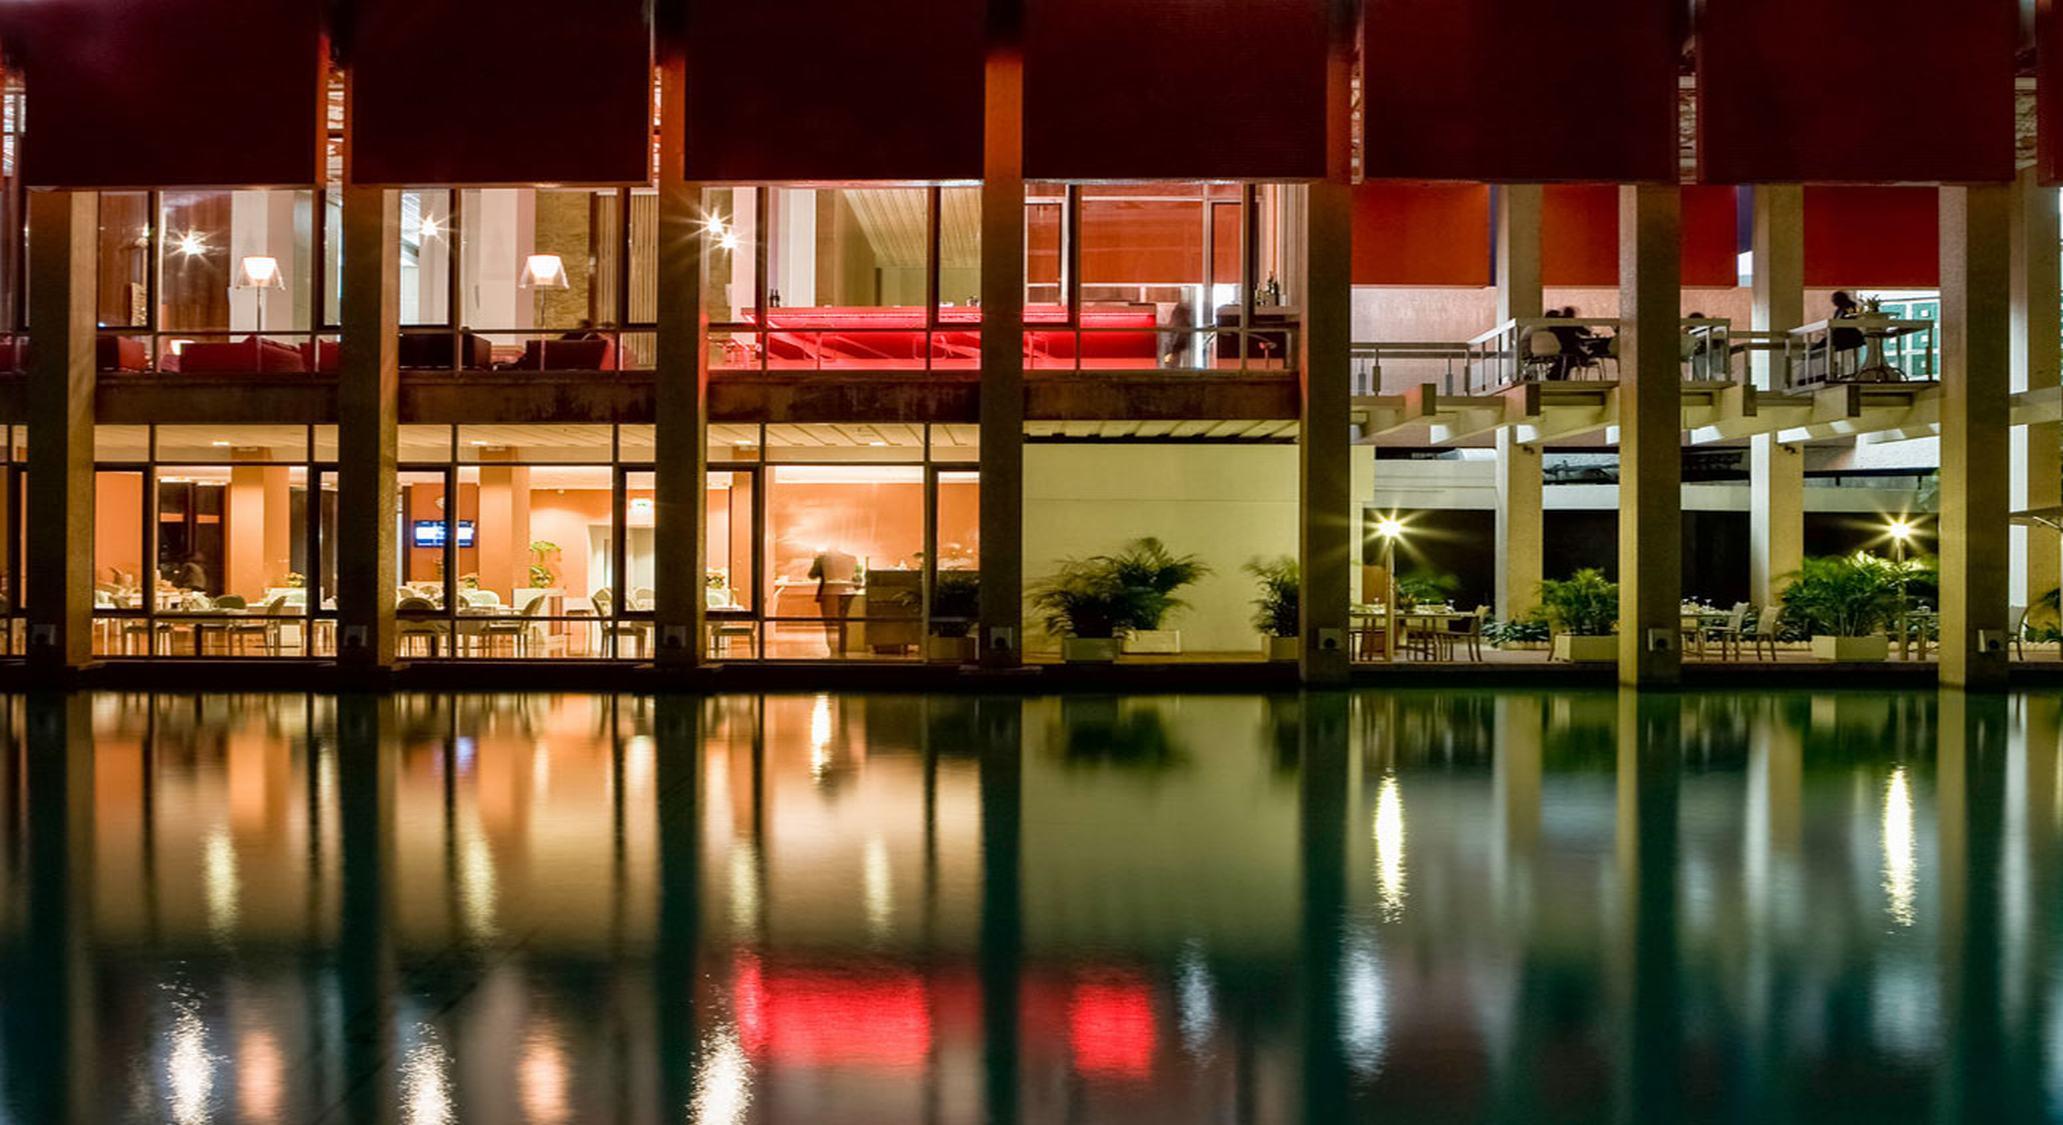 Sofitel Abidjan Hotel Ivoire, Abidjan